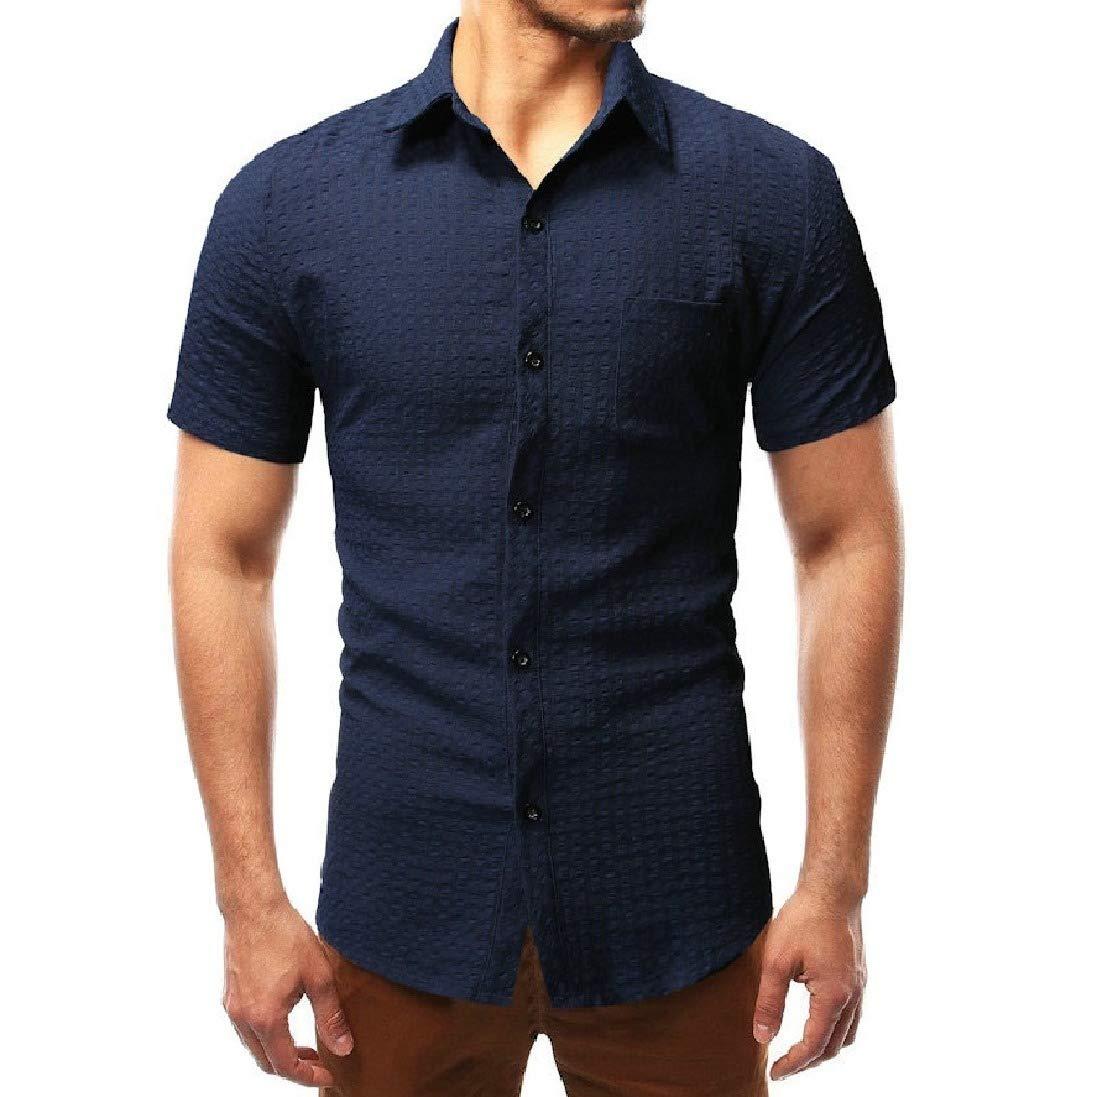 Winwinus Men Summer Casual Half Sleeve Lapel Pleated Button Dress Shirt